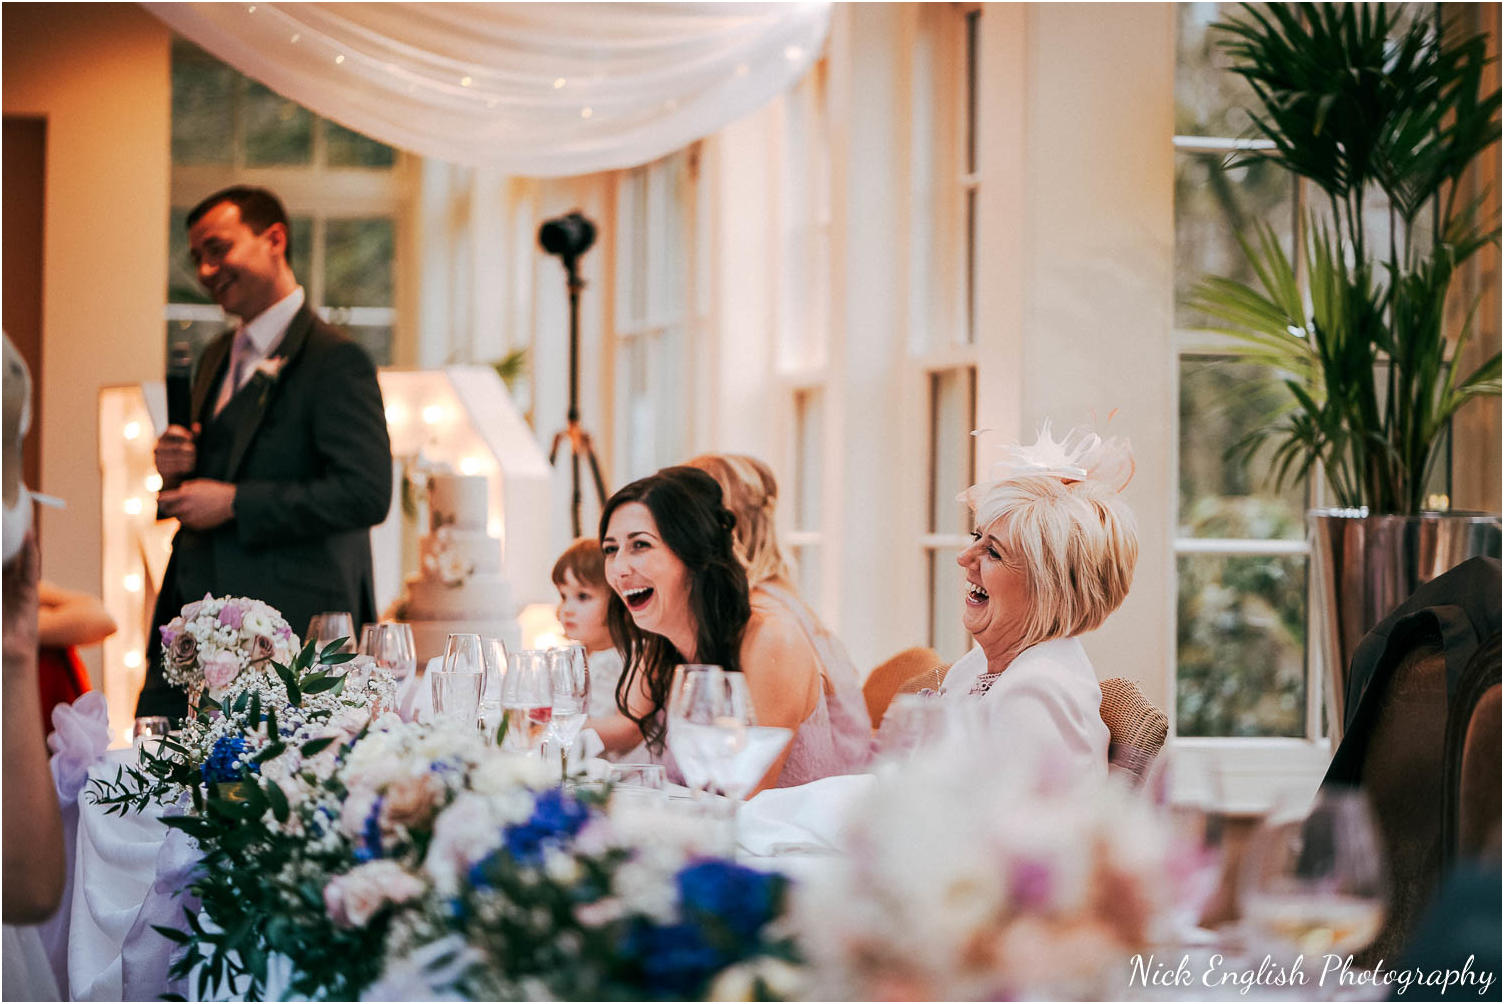 Mitton_Hall_Wedding_Photographer_2018-130.jpg